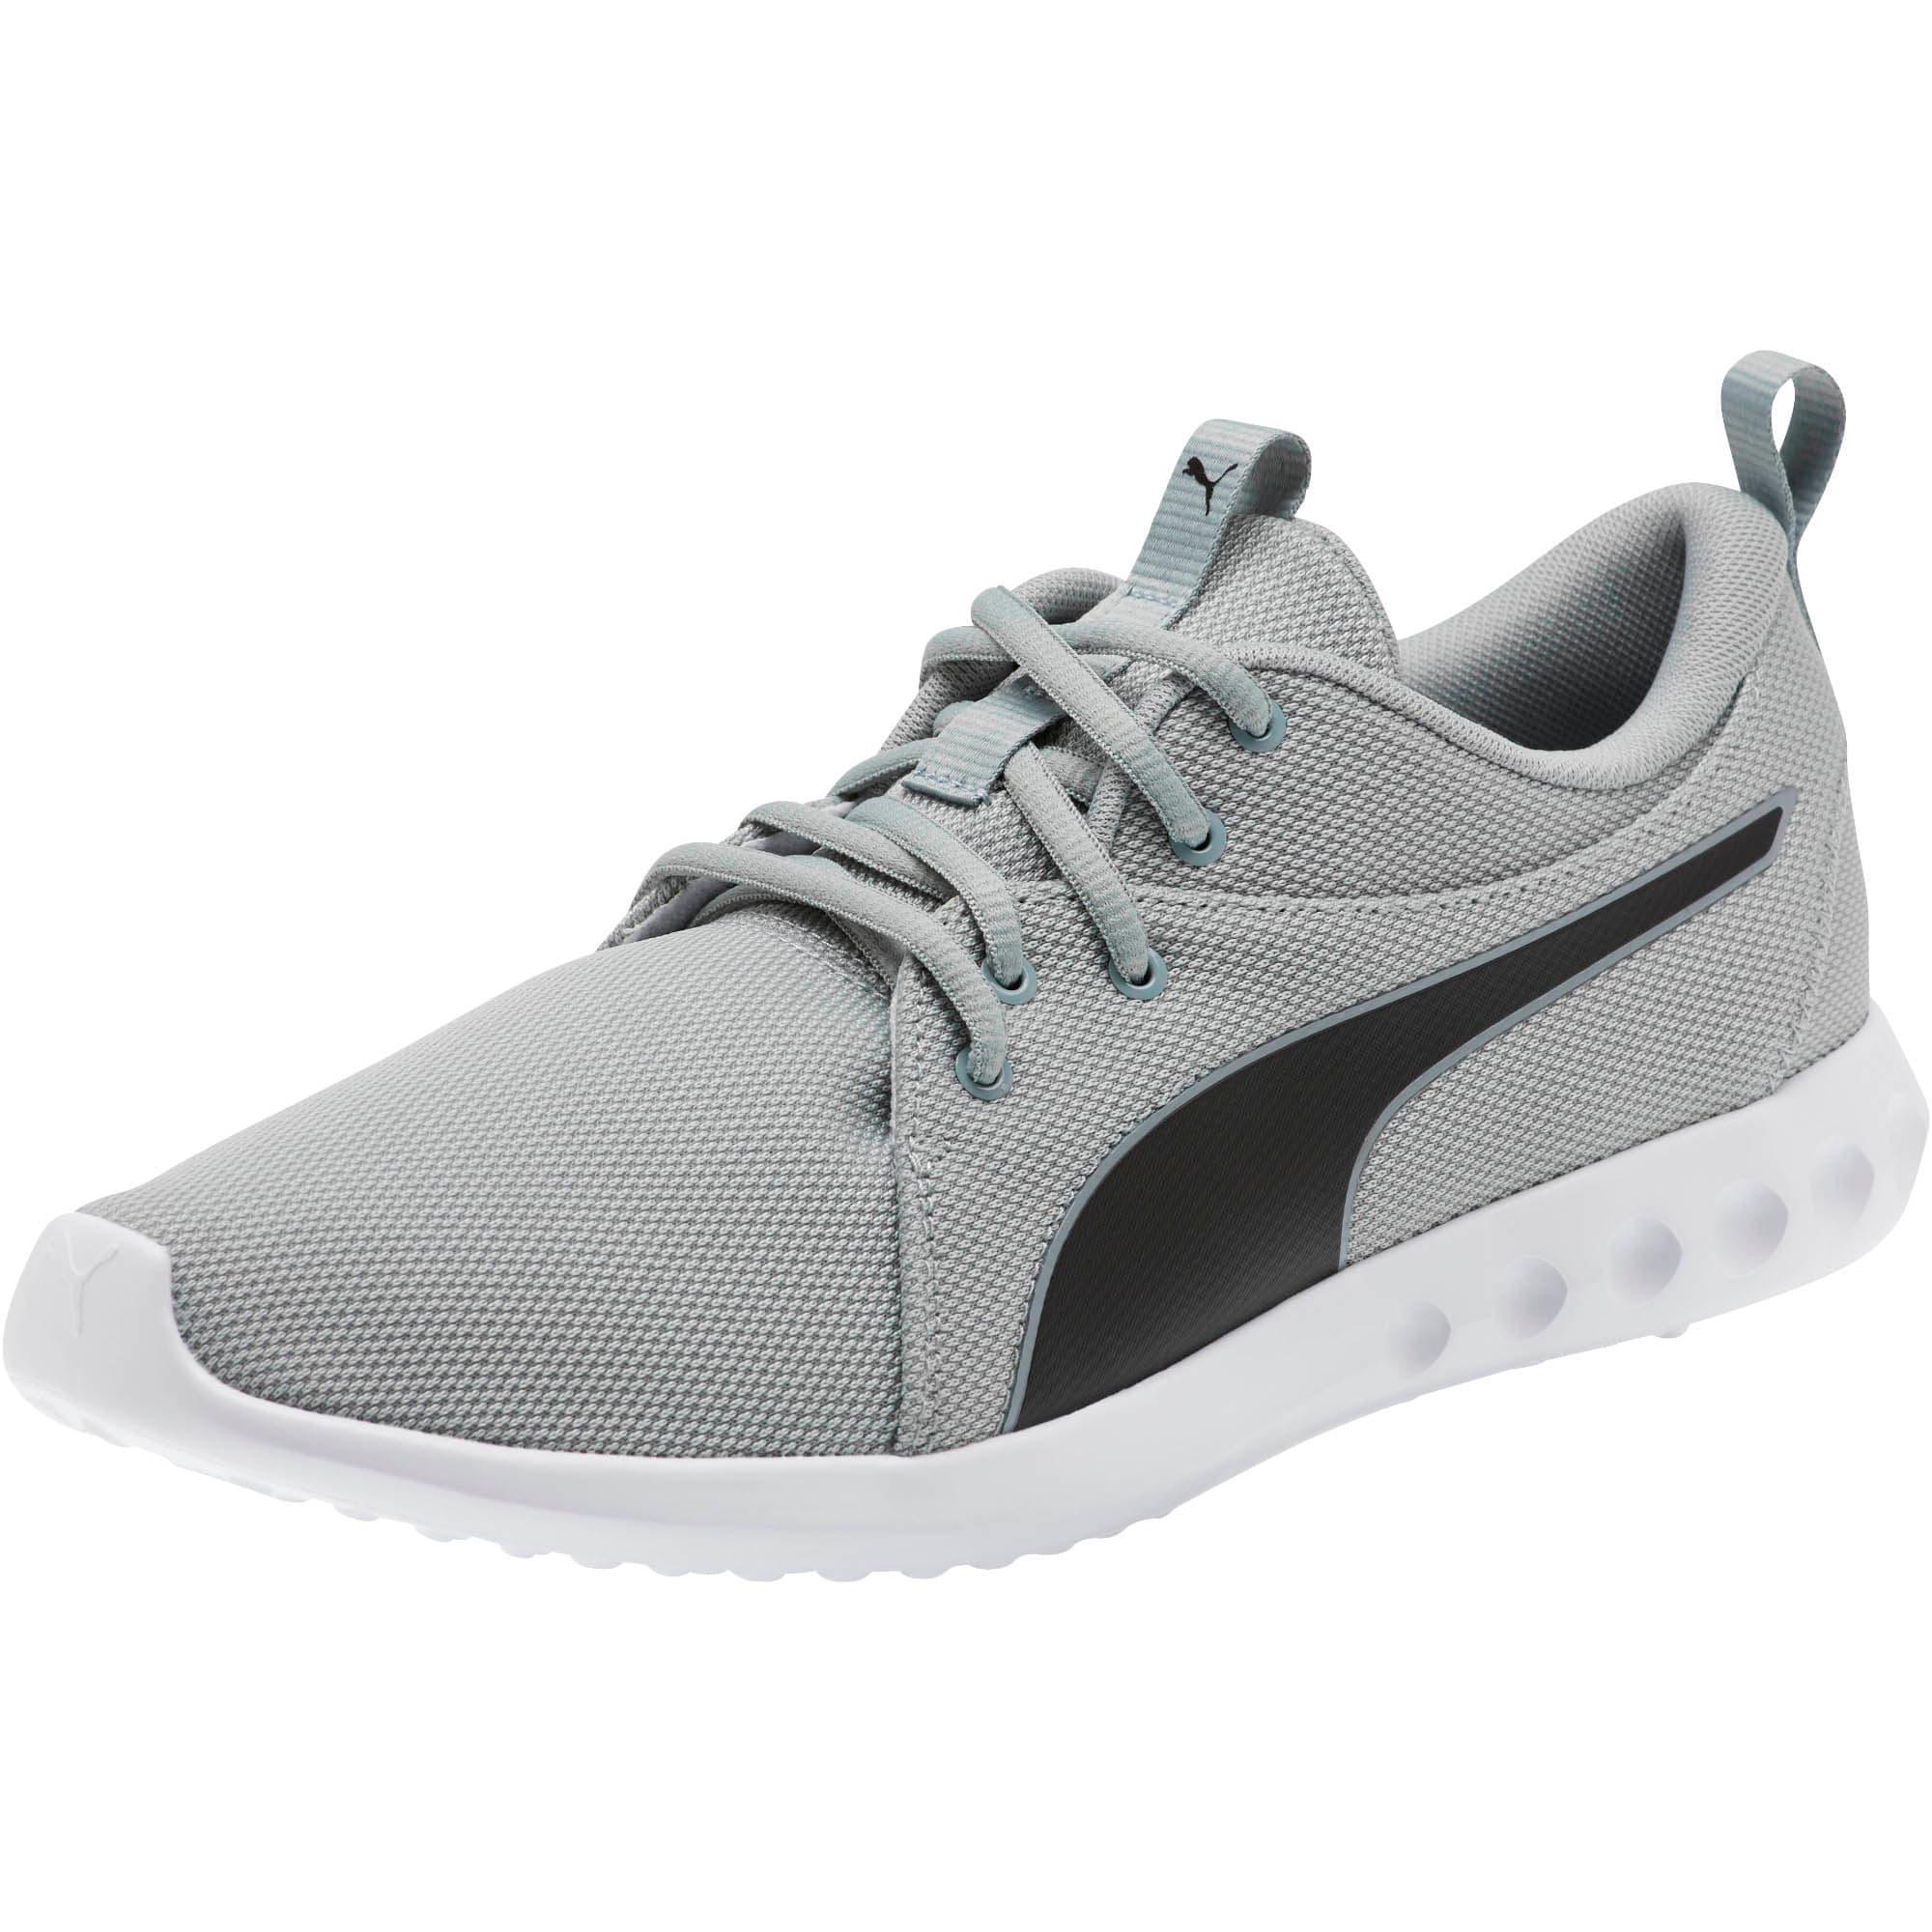 Thumbnail 1 of Carson 2 Cosmo Men's Running Shoes, Quarry-Puma Black, medium